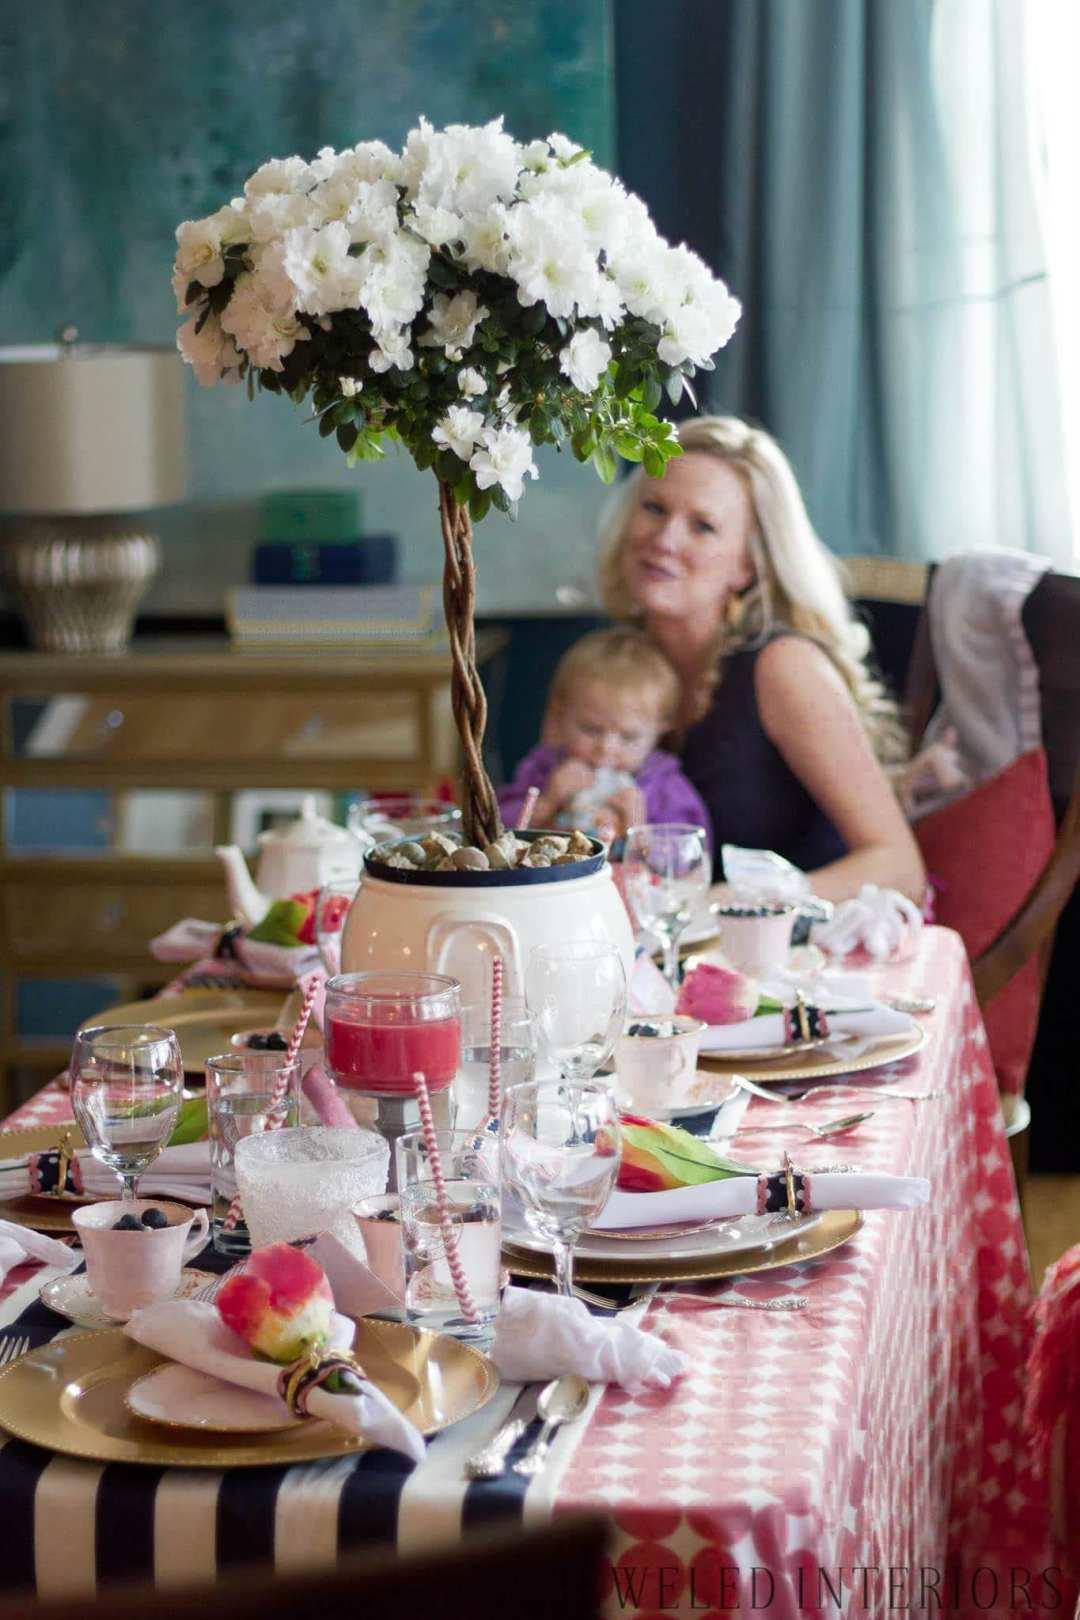 Vintage Tea party Tablescape, Jeweled Interiors, stripe, polka dot, blue, walls, azalea tree, paper straws